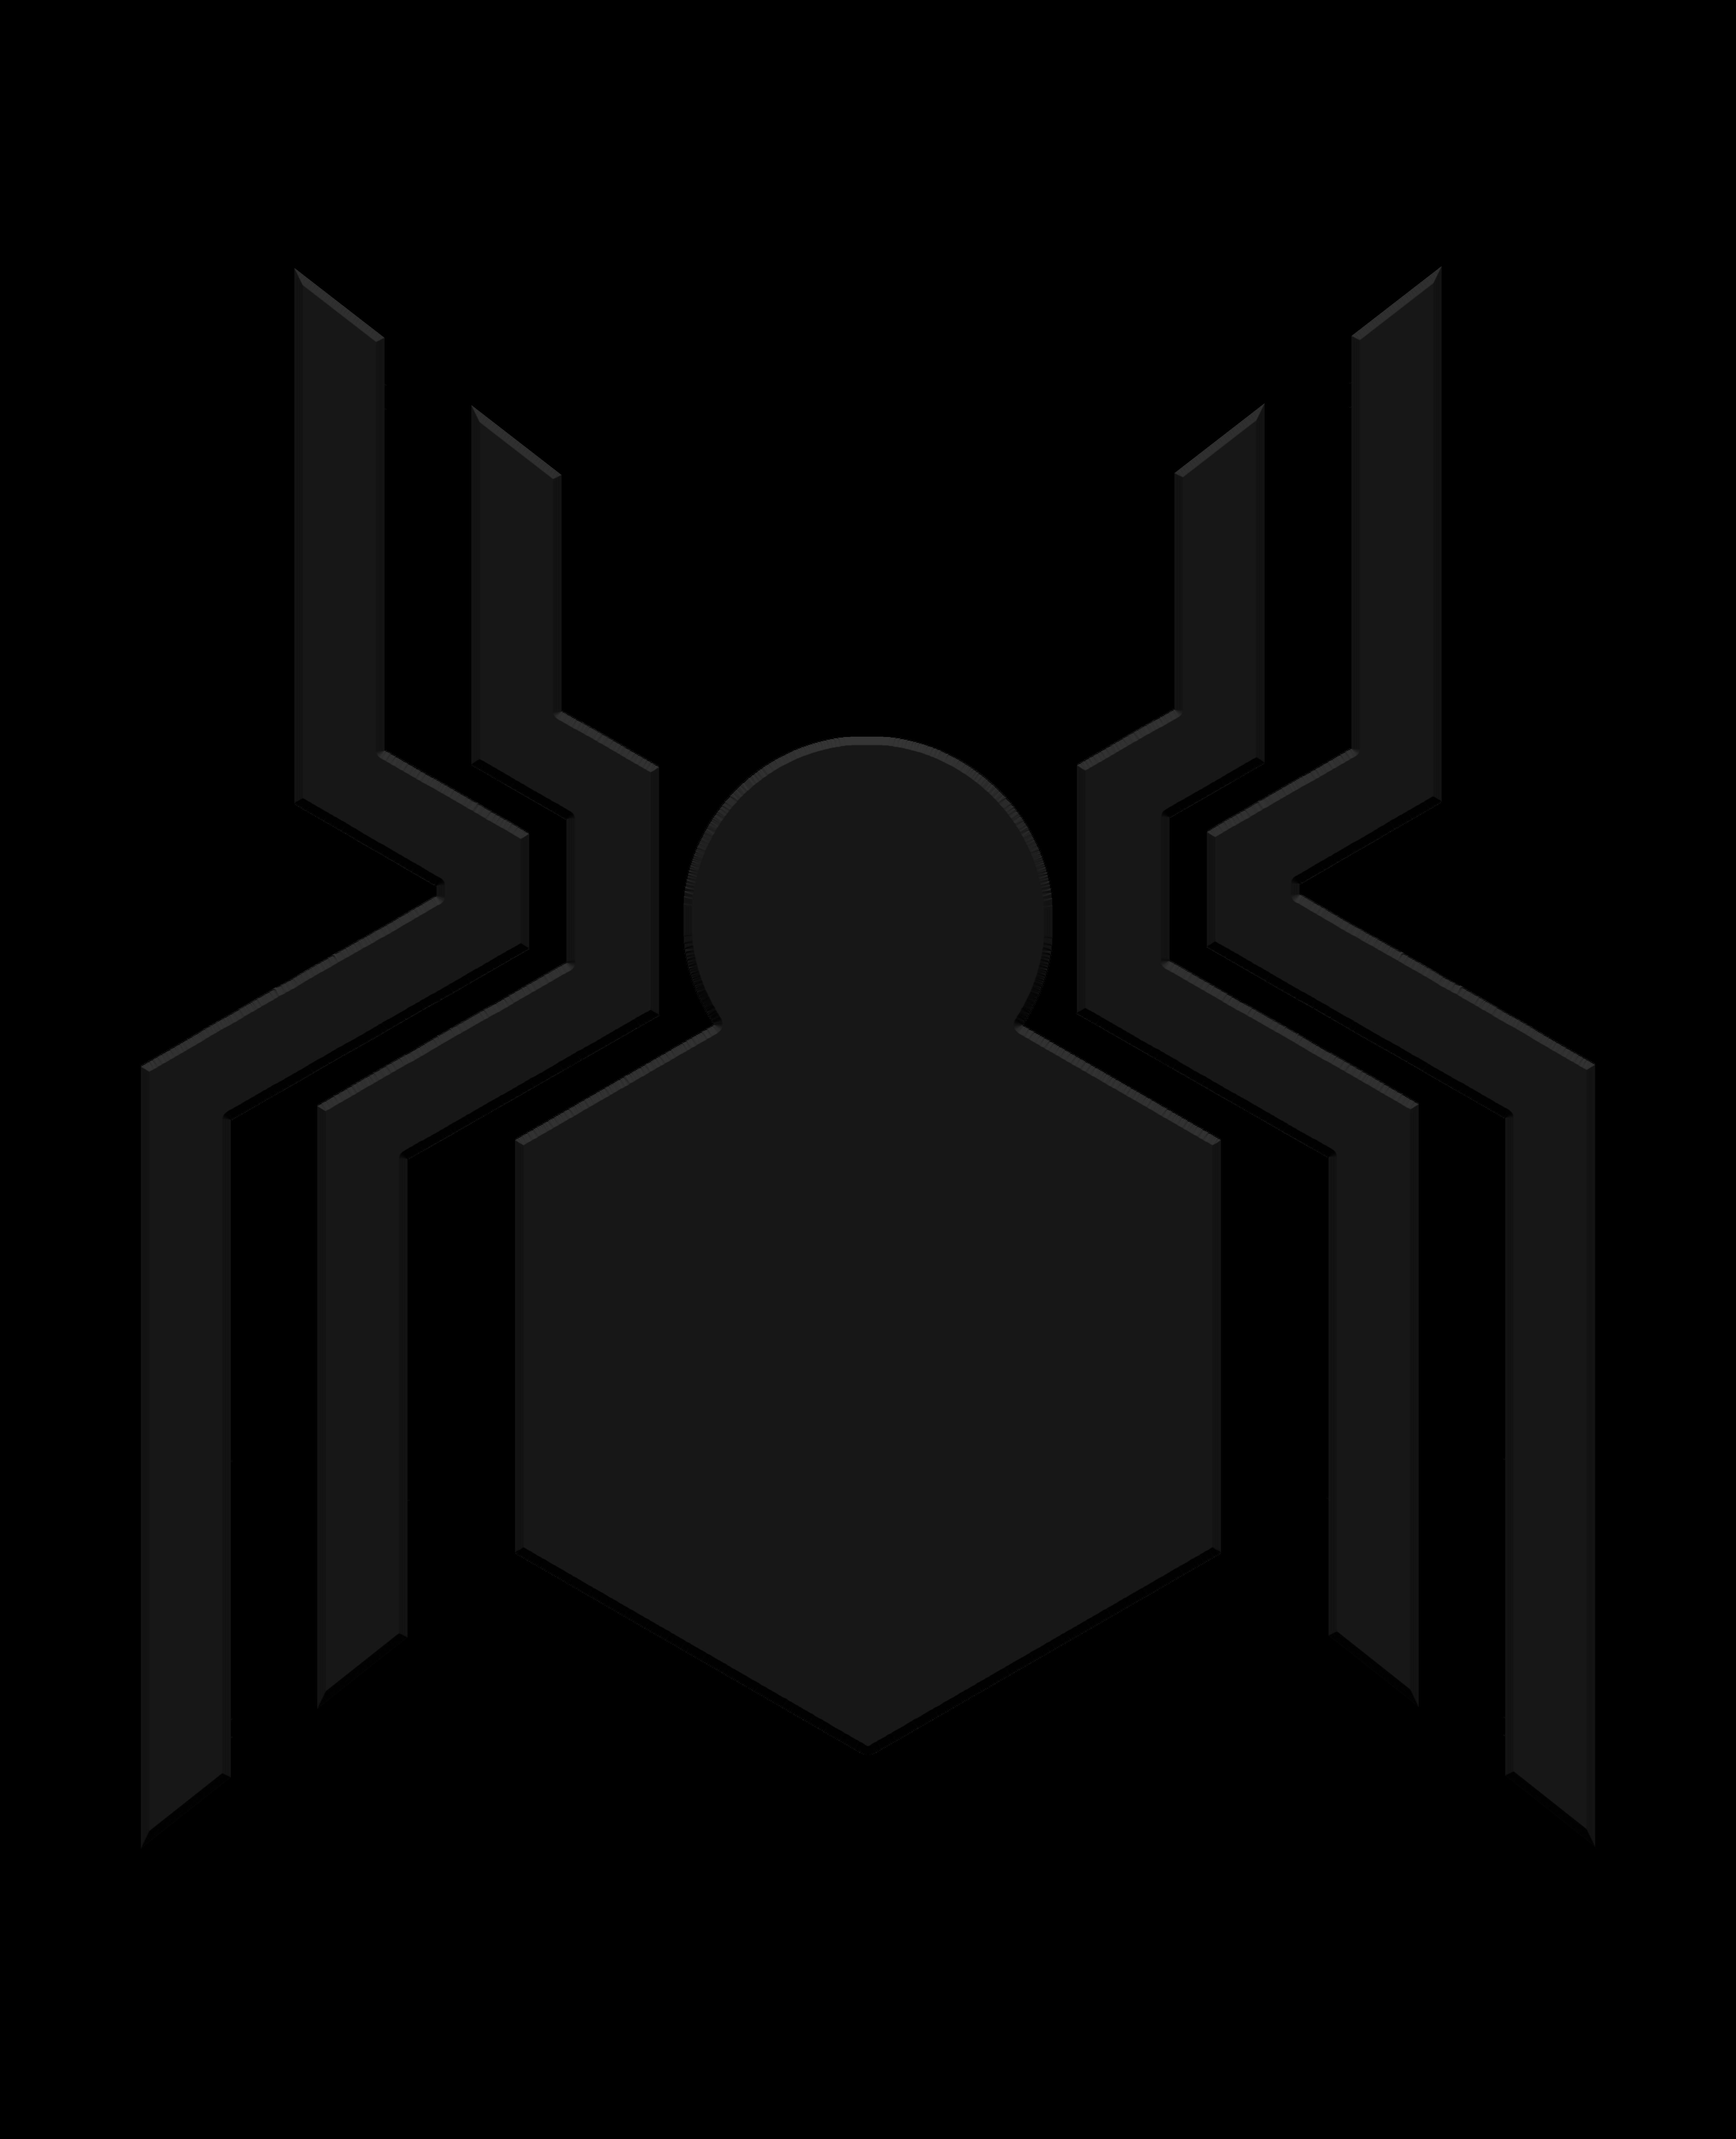 Image Result For New Spiderman Logo Spiderman Art Spiderman Drawing Spiderman